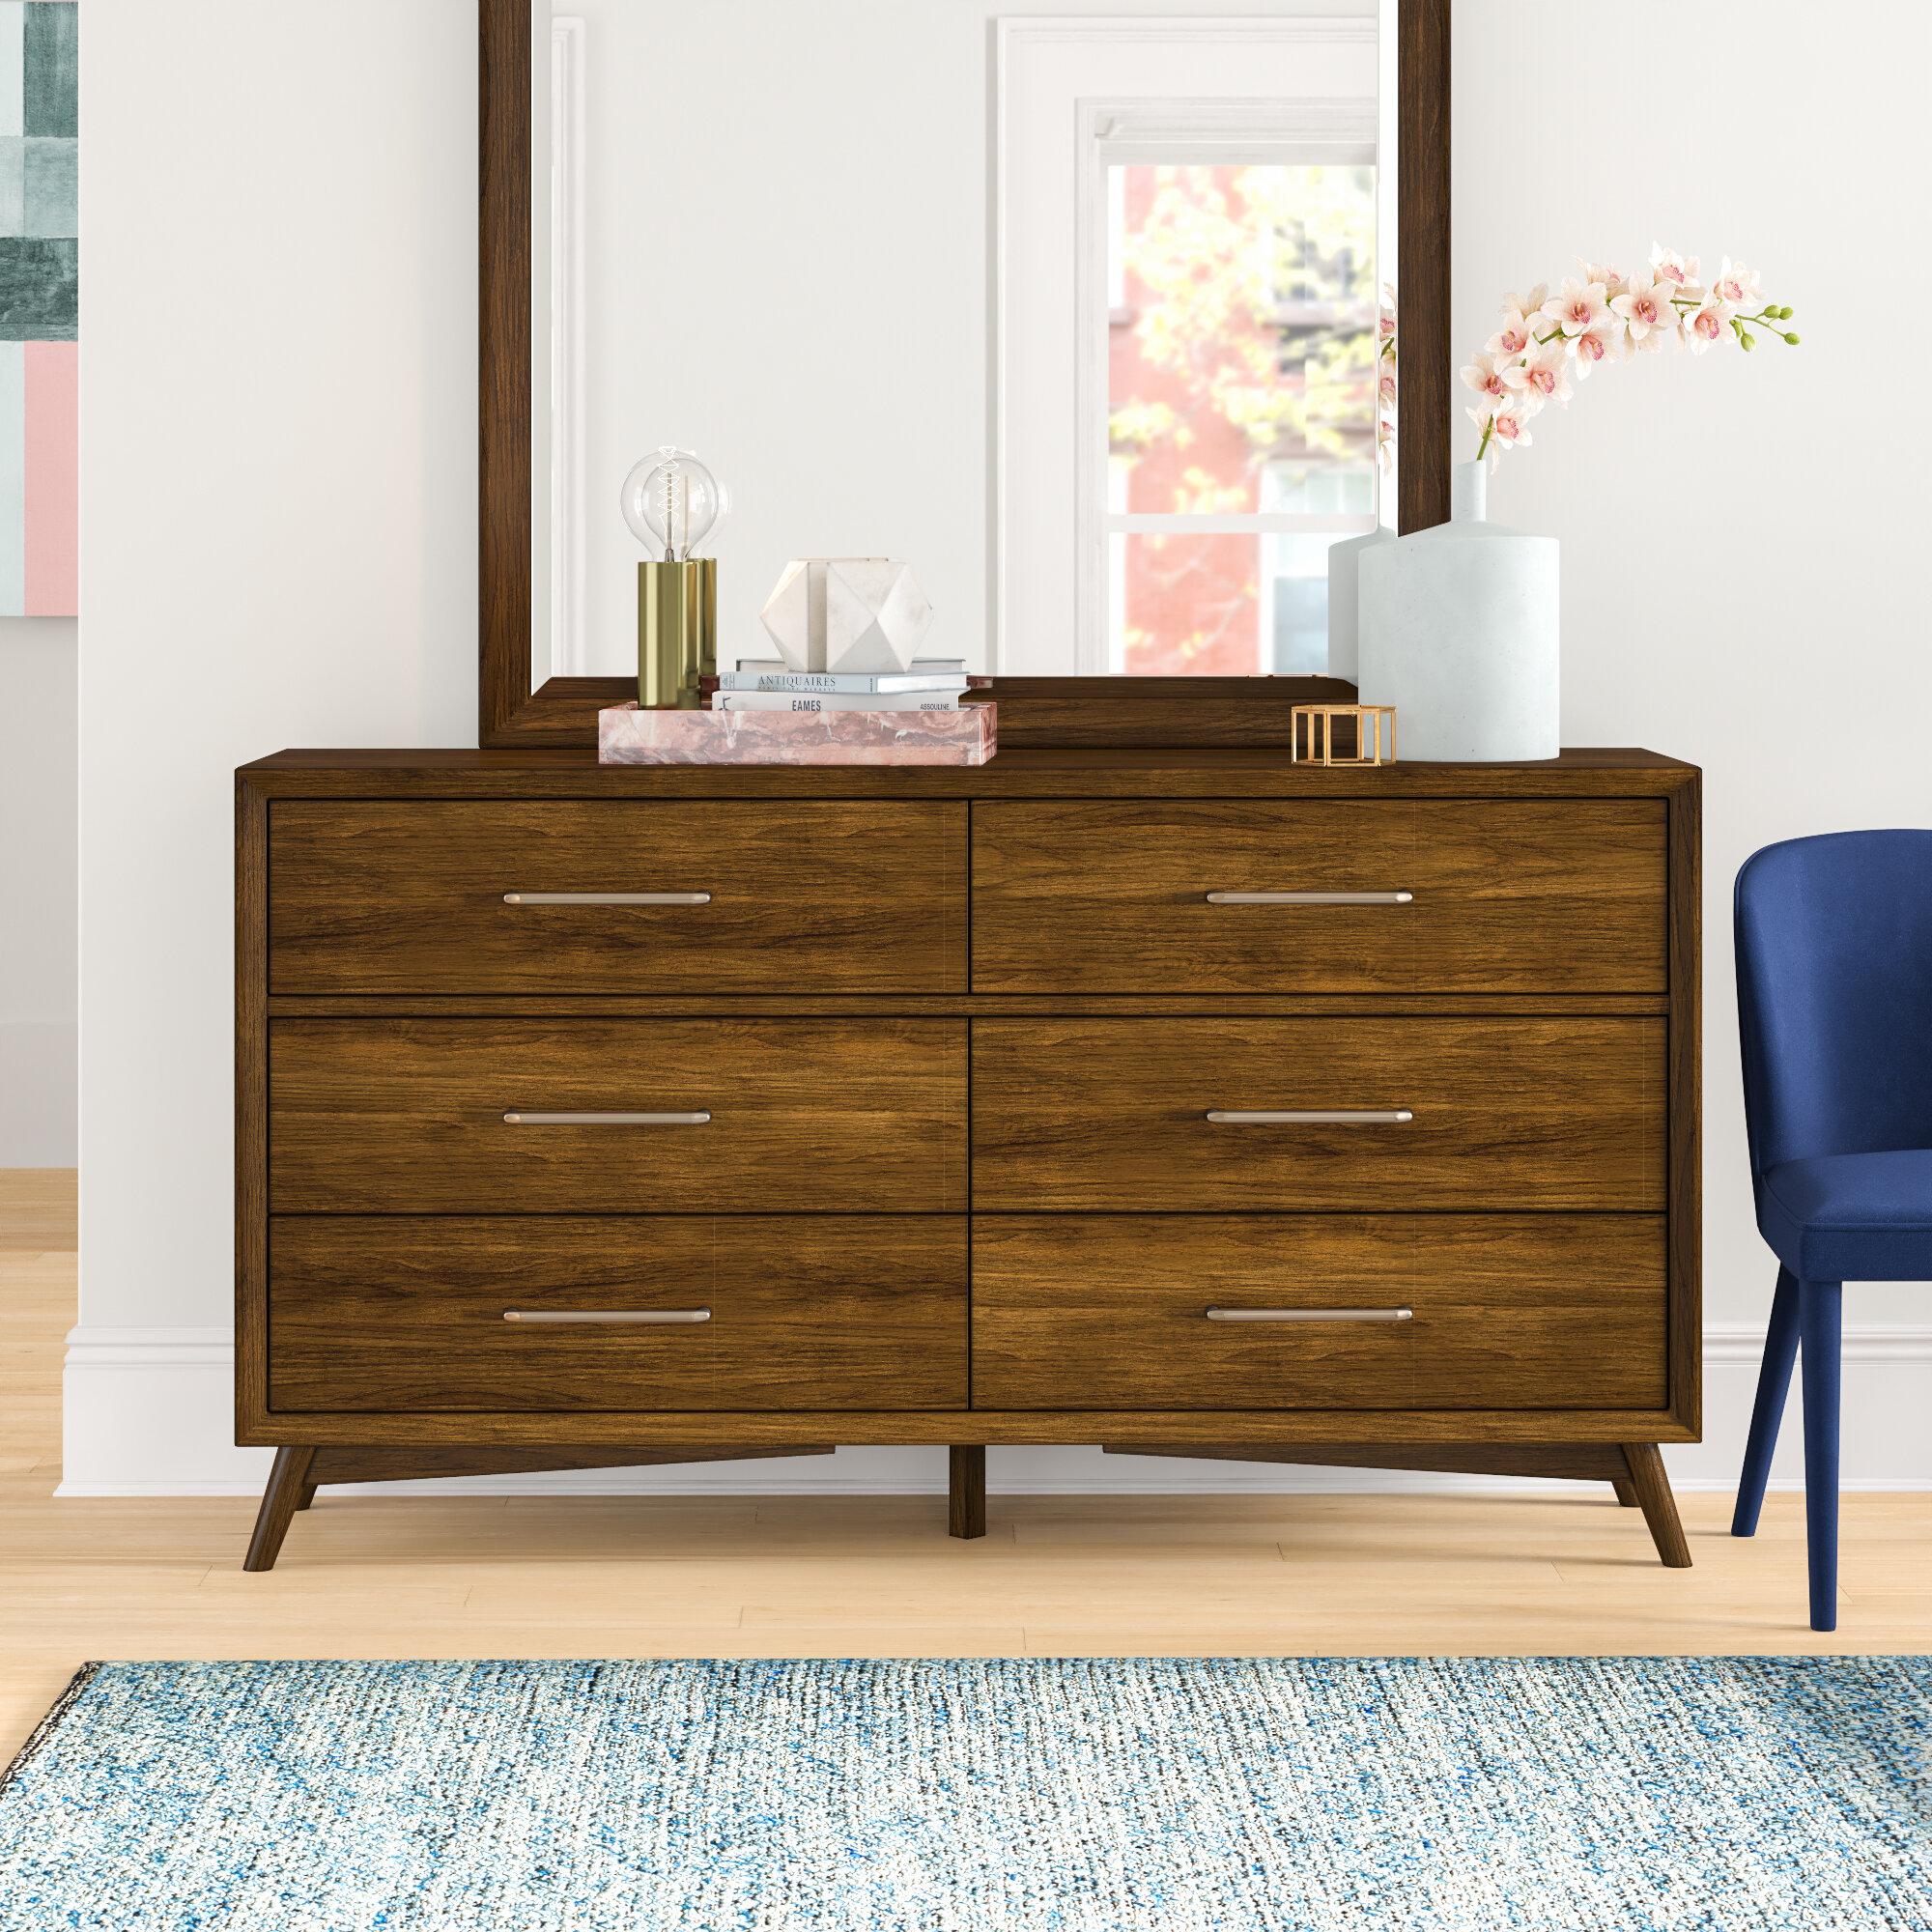 Foundstone Alleya 6 Drawer Double Dresser With Mirror Reviews Wayfair